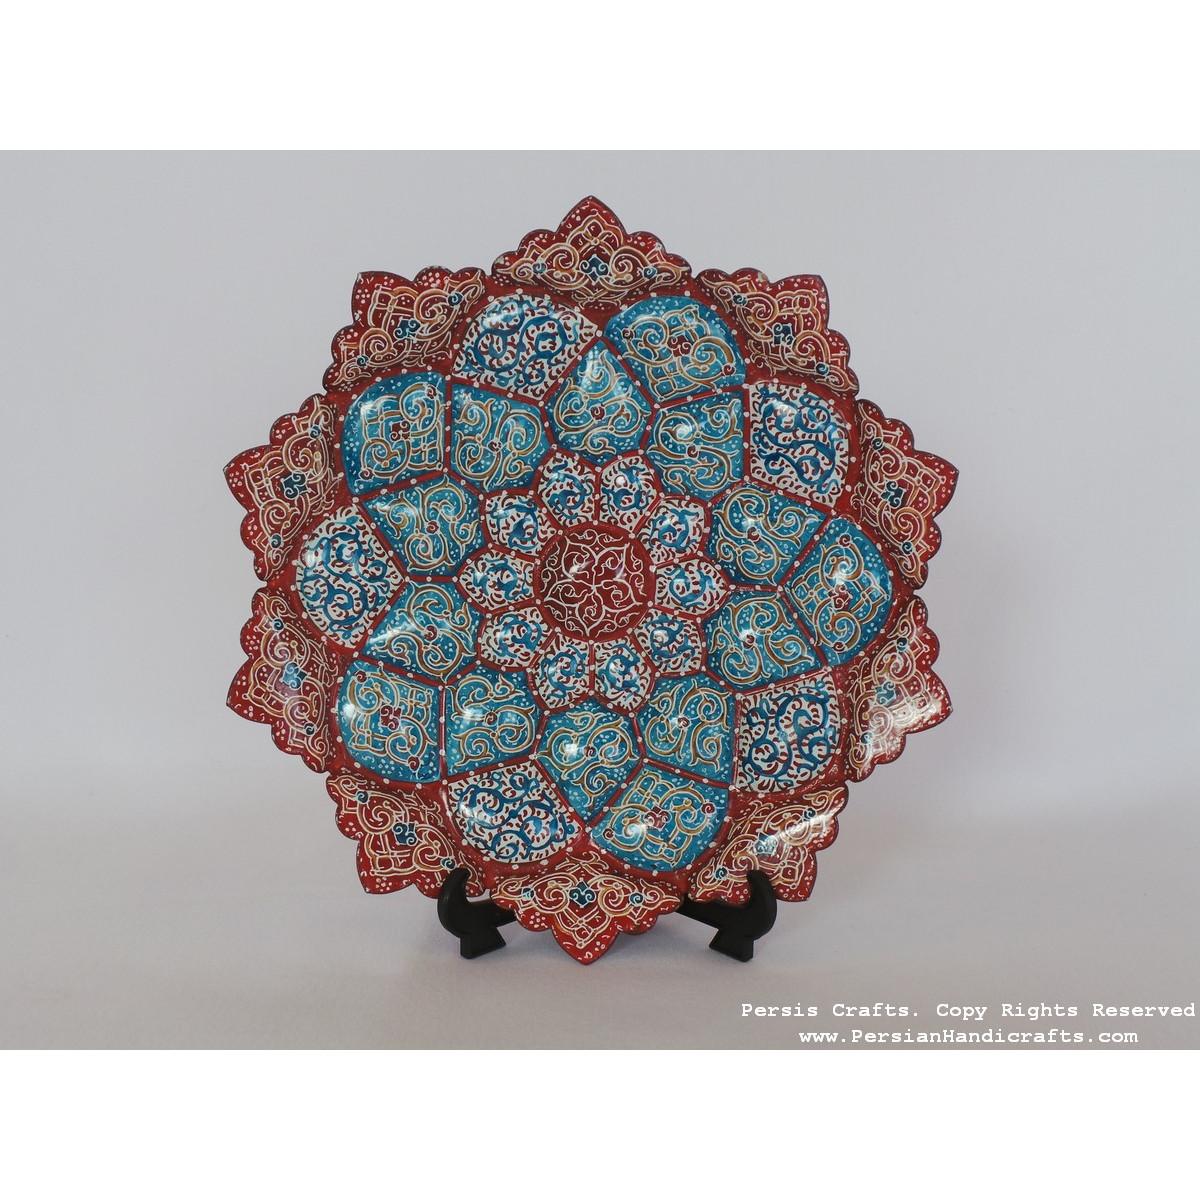 Wall Hanging Plate - Enamel (Minakari) on Copper - HE3030-Persian Handicrafts